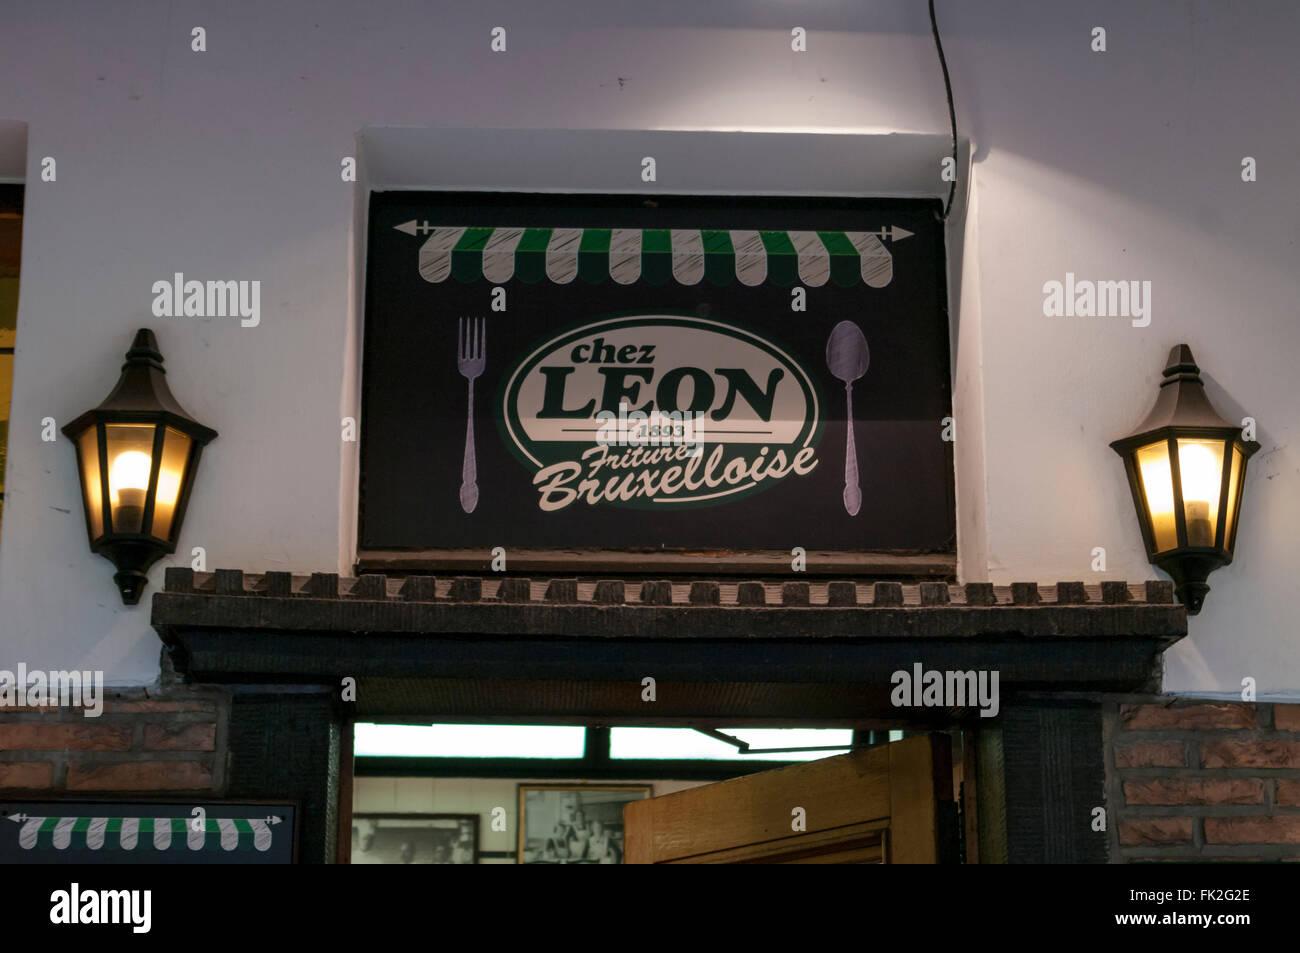 Sign of the traditional Chez Léon restaurant, established 1893. Bruxelles, Belgium. - Stock Image